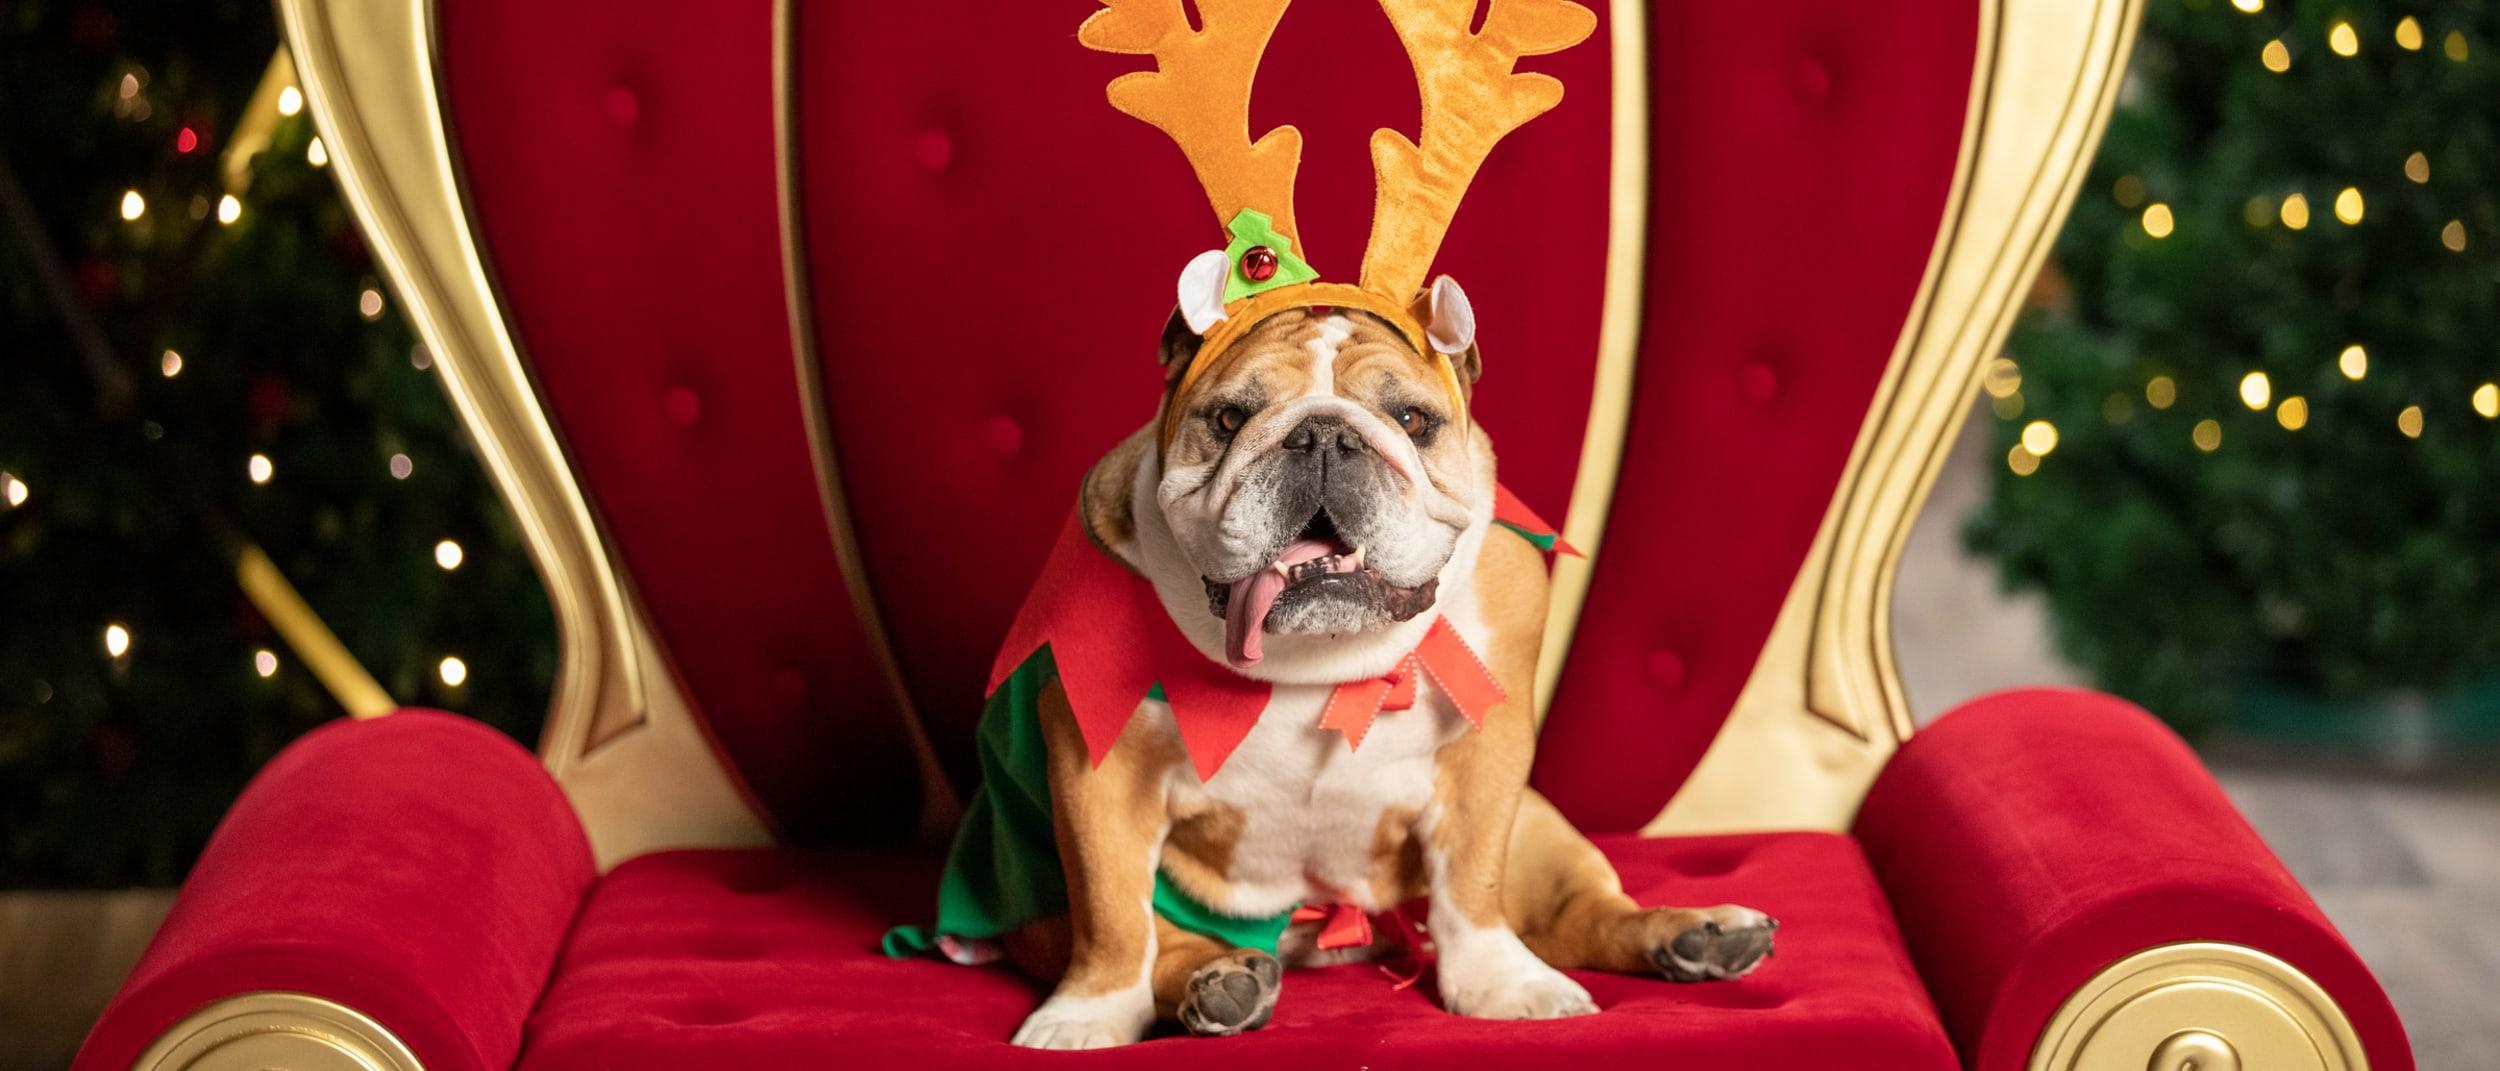 Dogs Photos with Santa